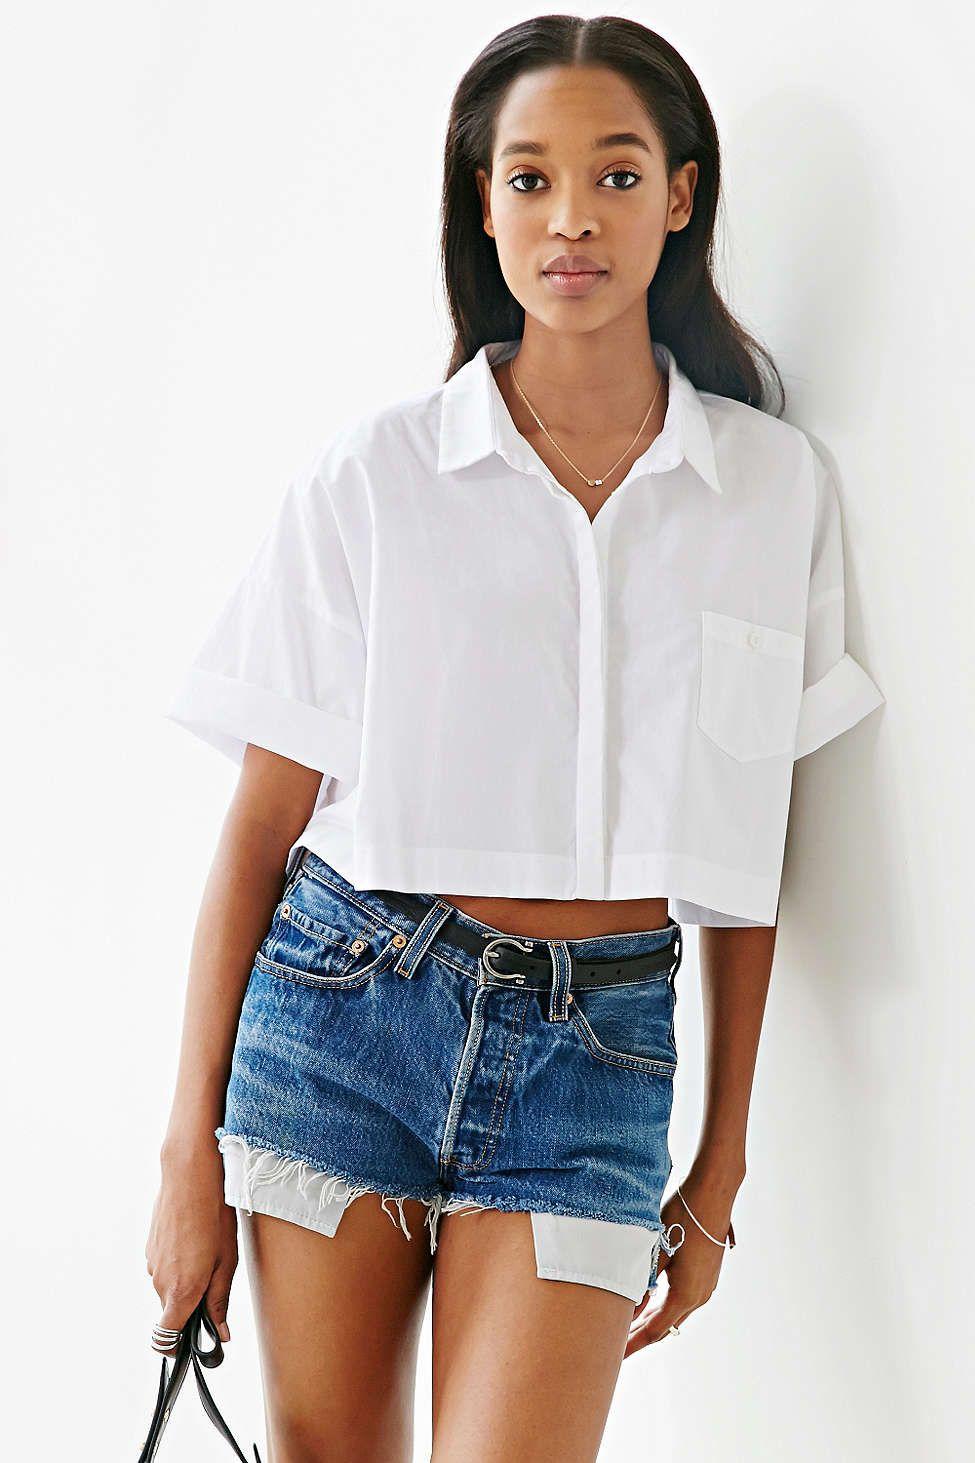 da36ec8d Lucca Couture Square Cropped Button-Down Shirt | Tomboy | Fashion ...